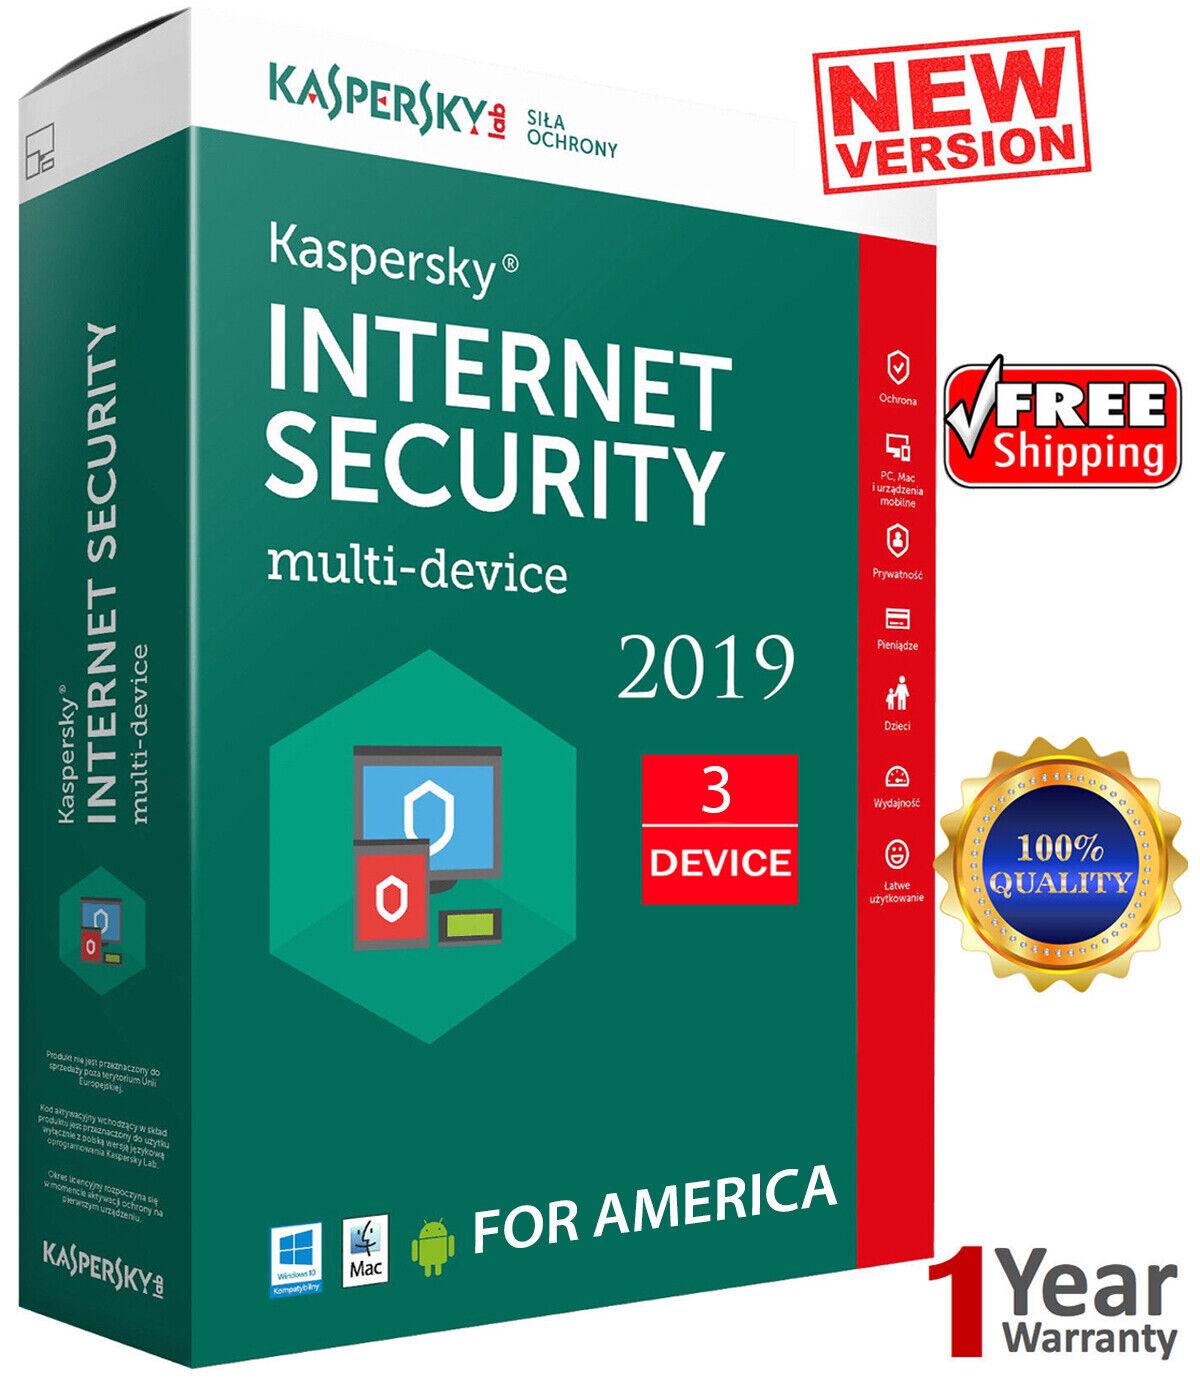 KASPERSKY INTERNET Security - 2020 / 3 Devices /1 Year/ Region - AMERICA  13.25$